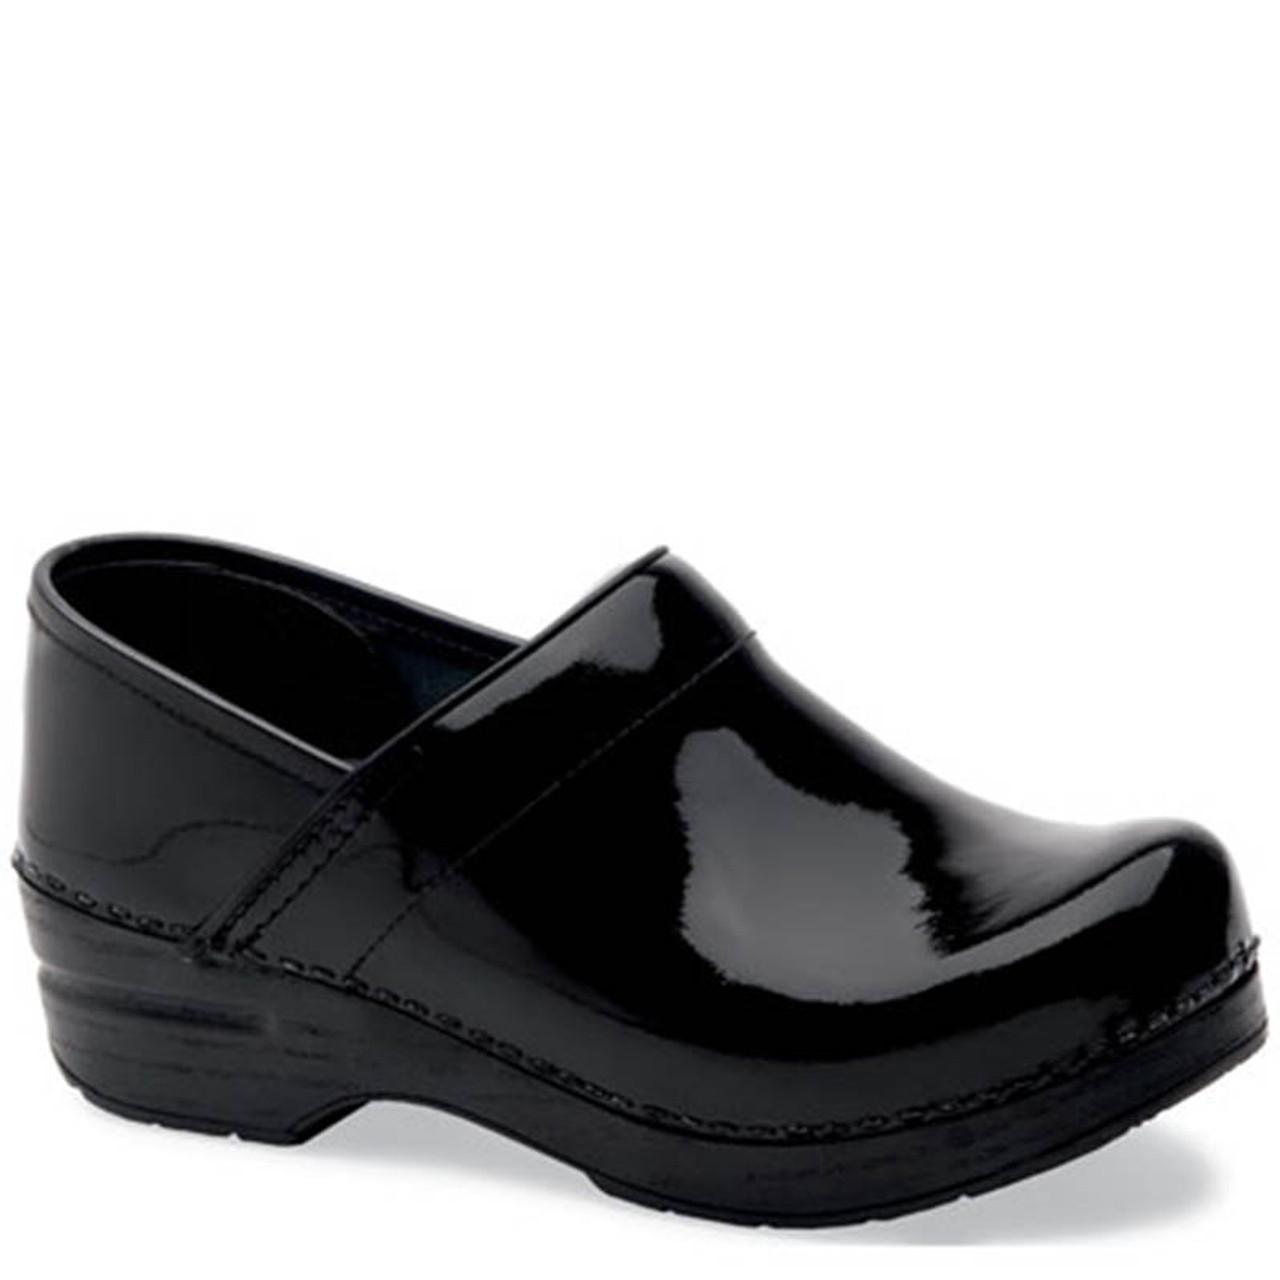 fc31fbaa710dd Dansko Professional Black Patent Clog